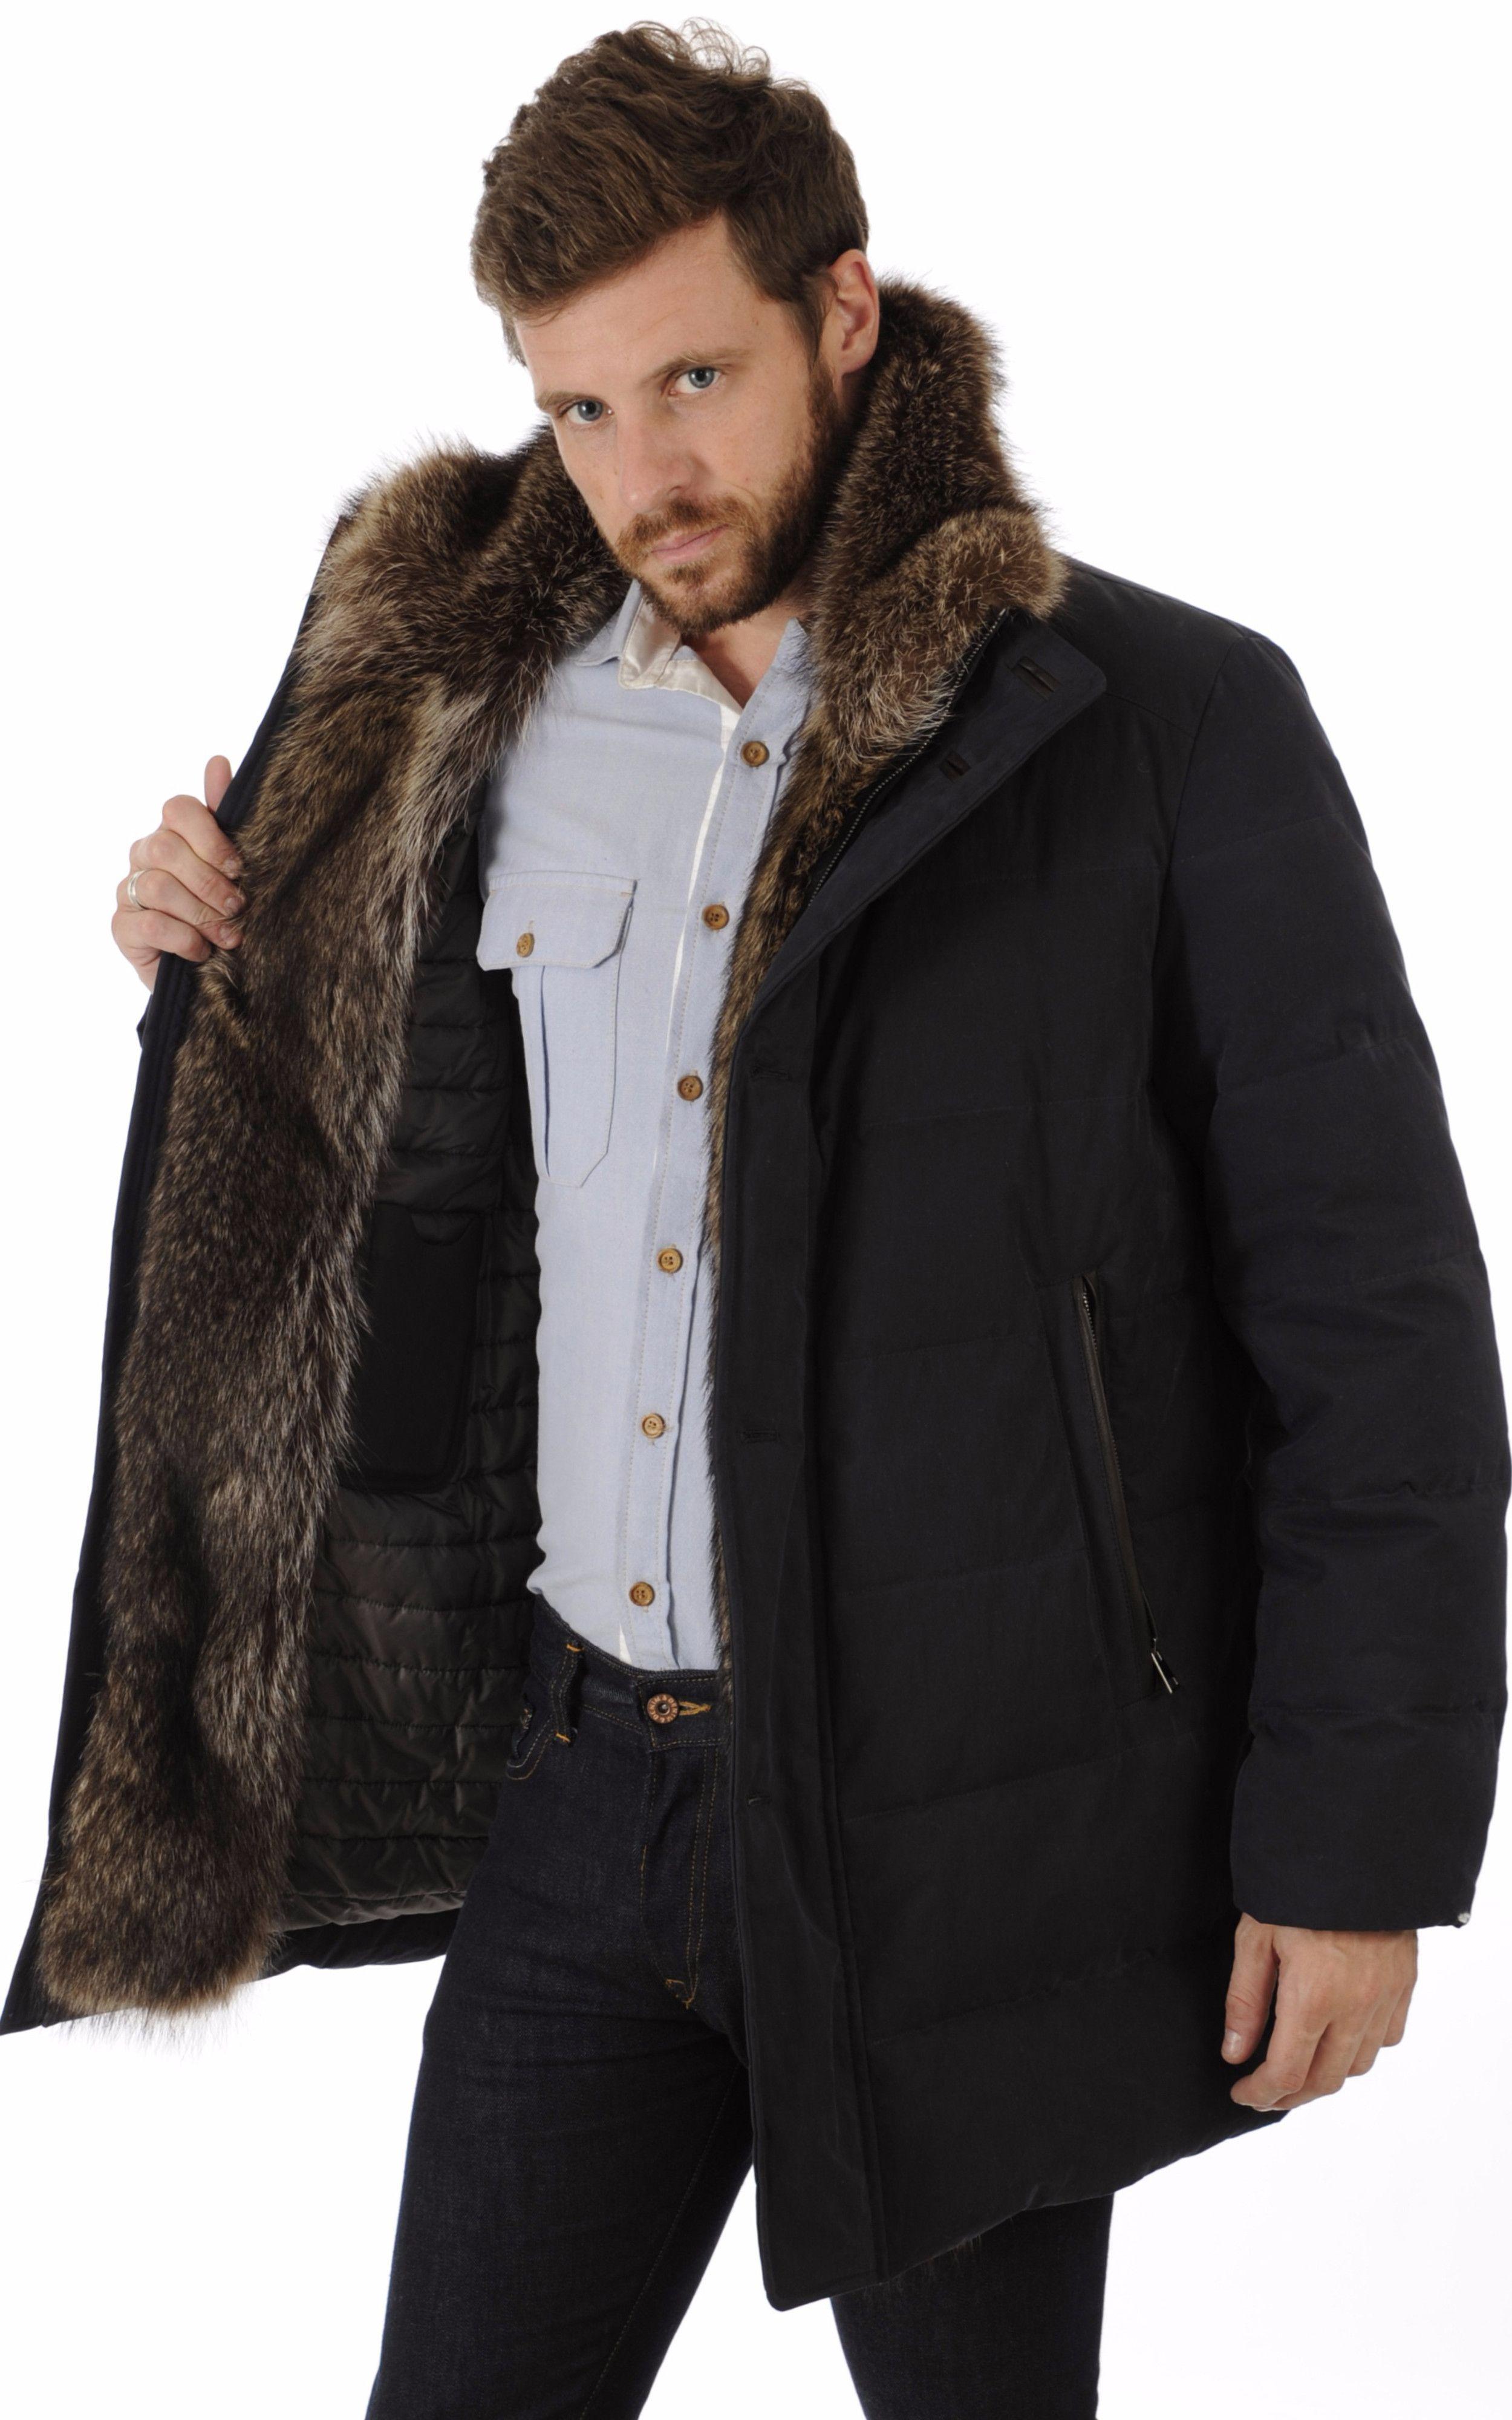 c6af6fafda12e Doudoune Chic Bordée Fourrure Gallotti Masculine Style, Mens Gear, Bleu  Marine, Fur Coats